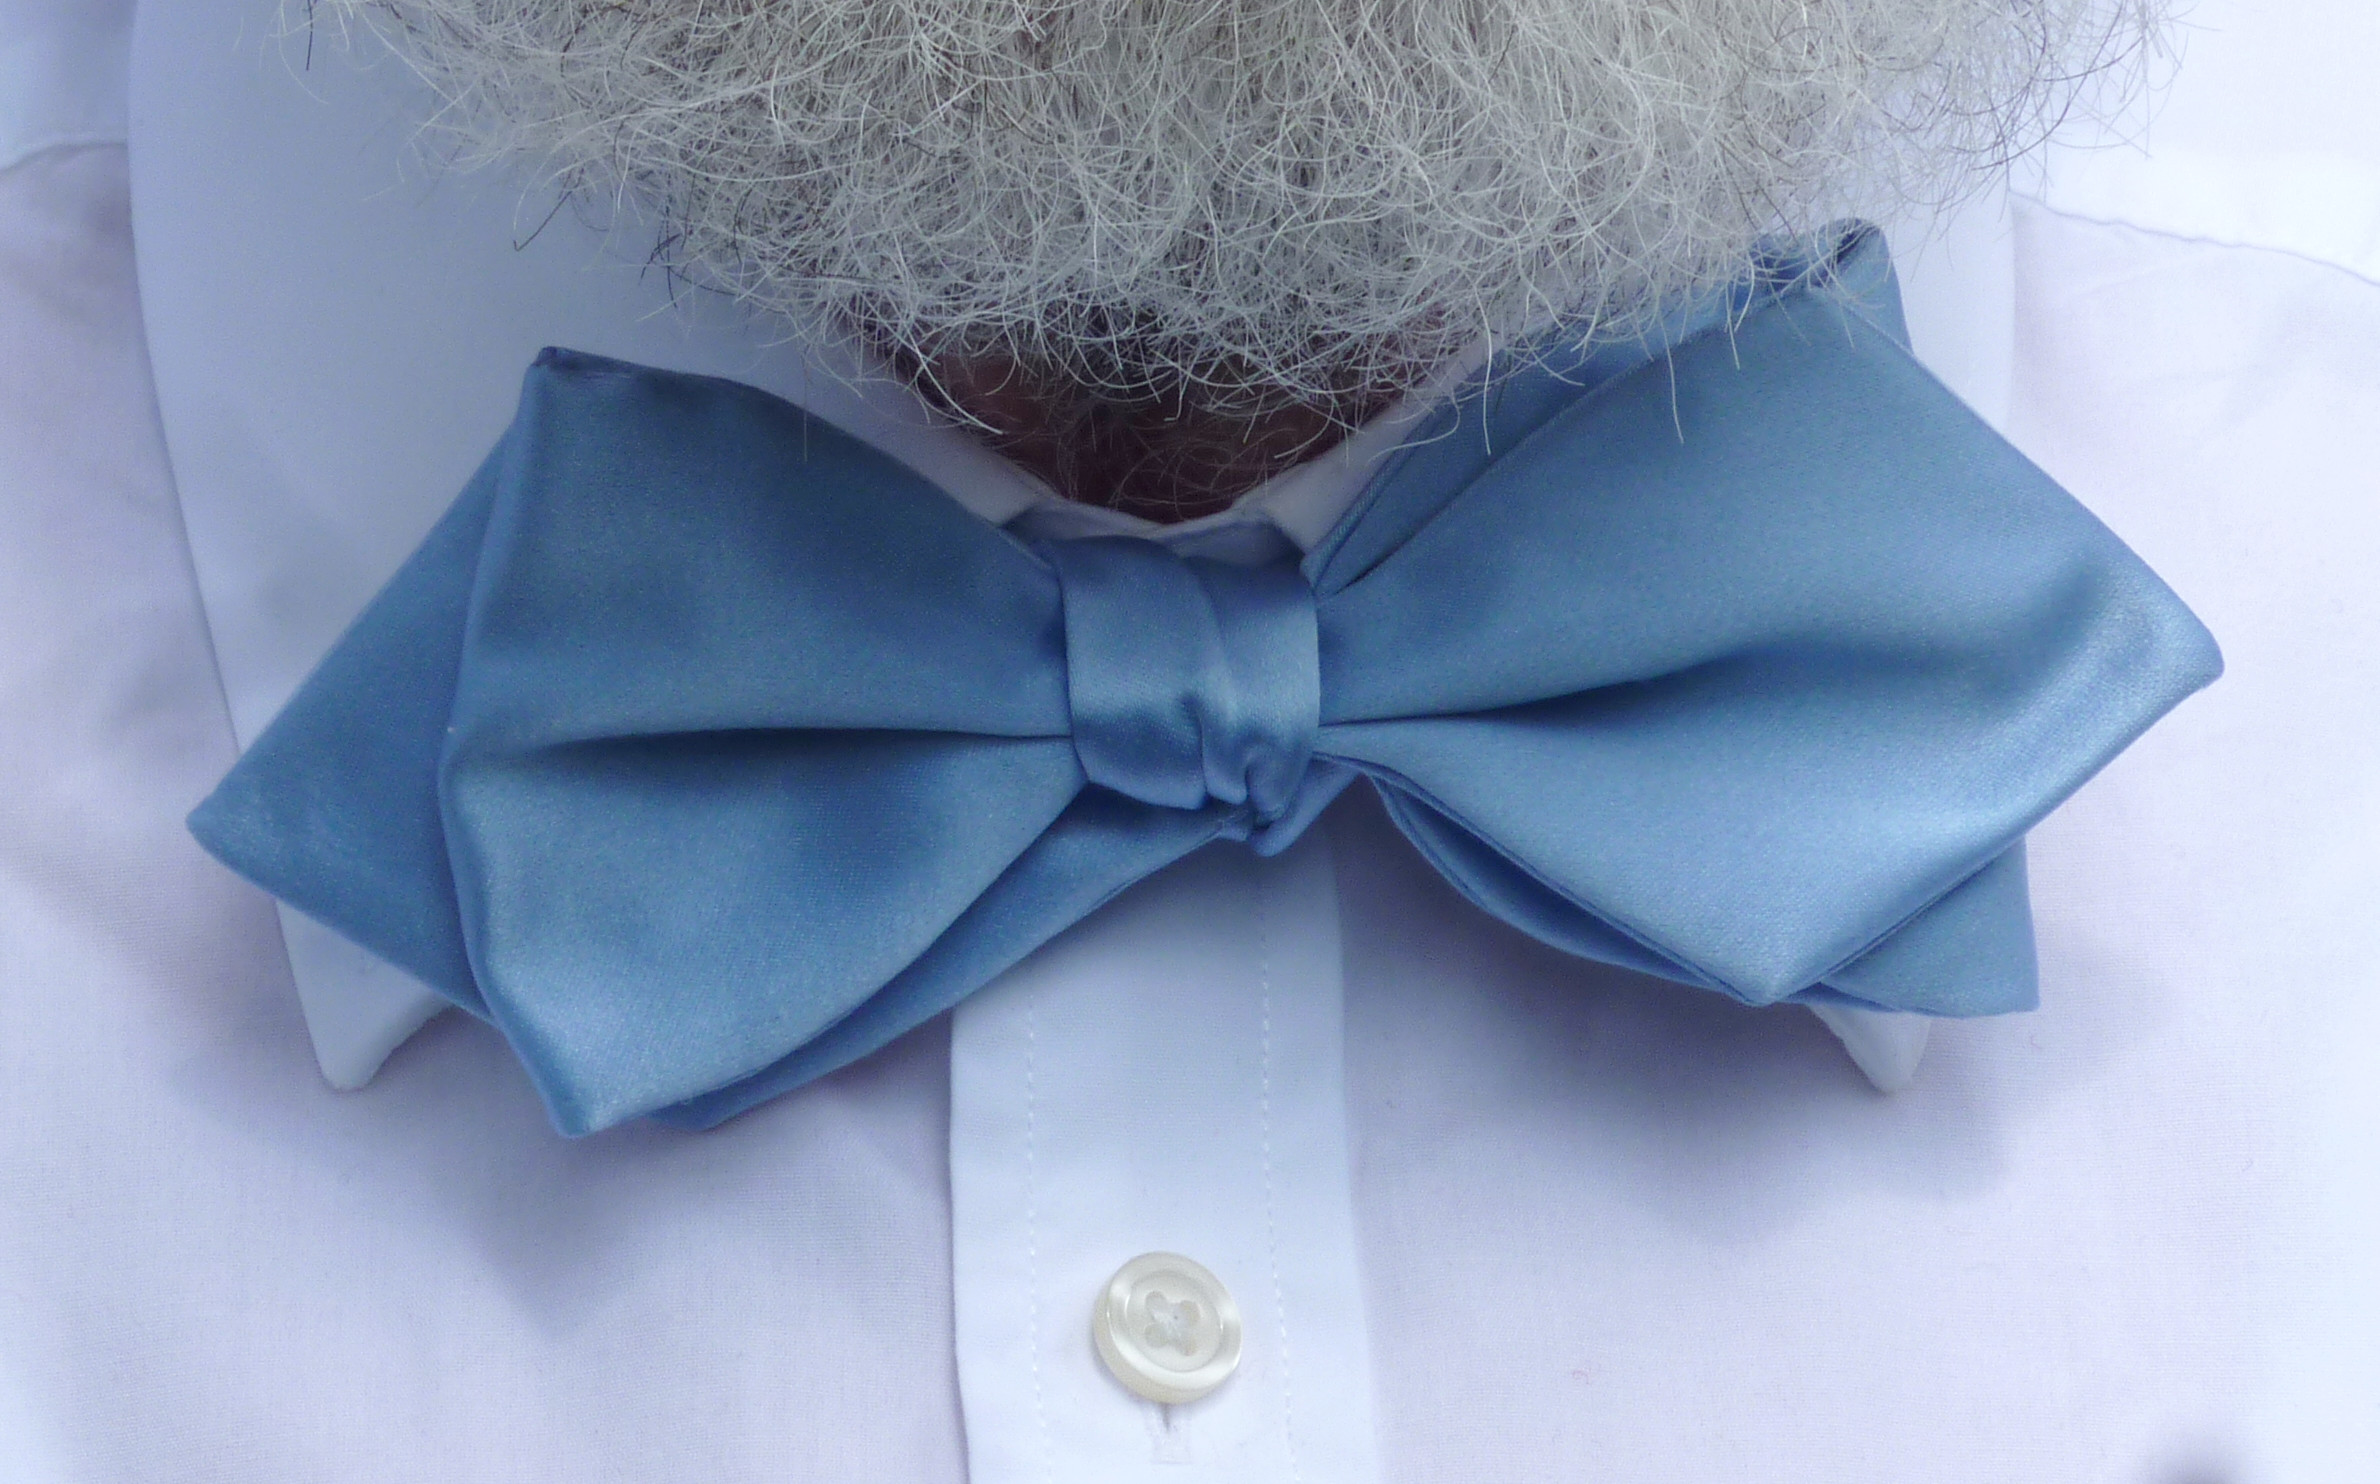 Bow Tie Wikipedia Tying Diagram Type Diamond Point Silk